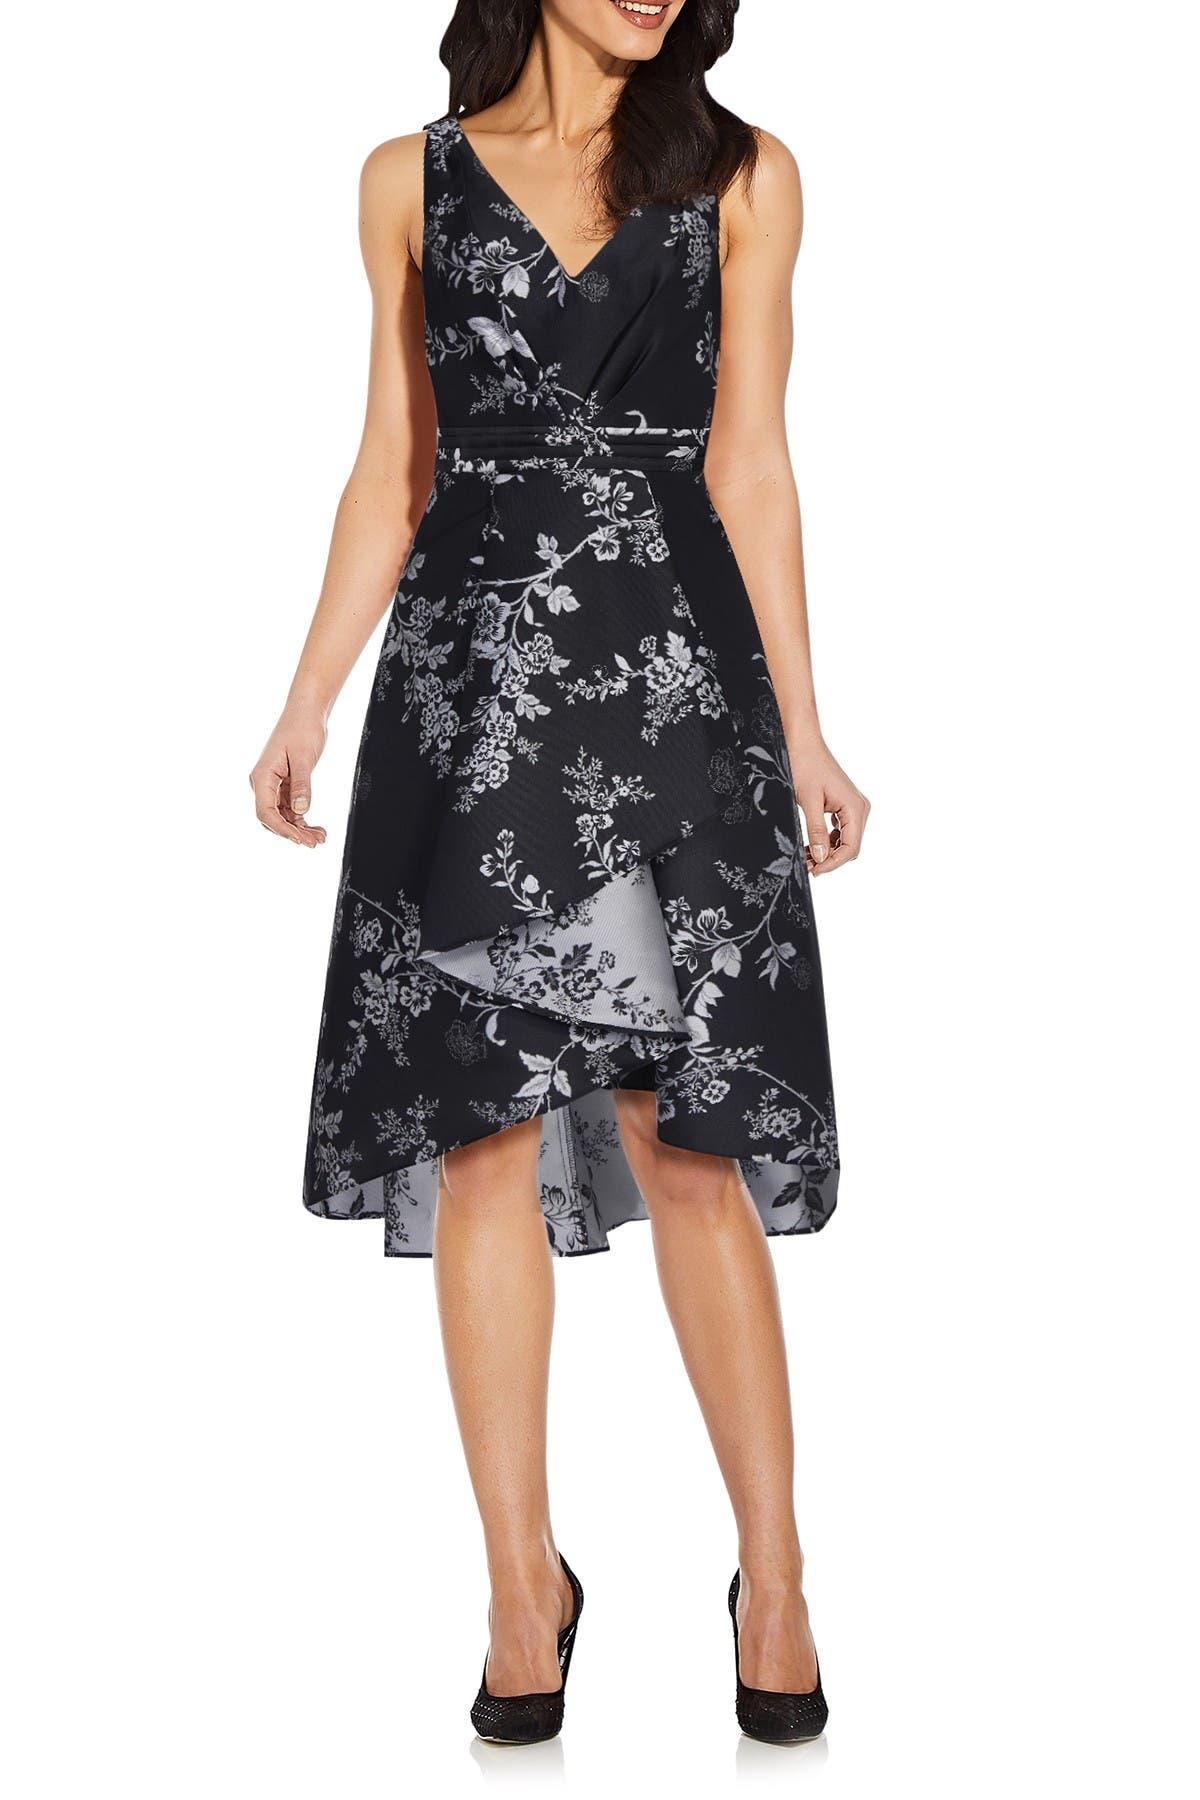 Image of Adrianna Papell Printed Jacquard High/Low Hem Dress